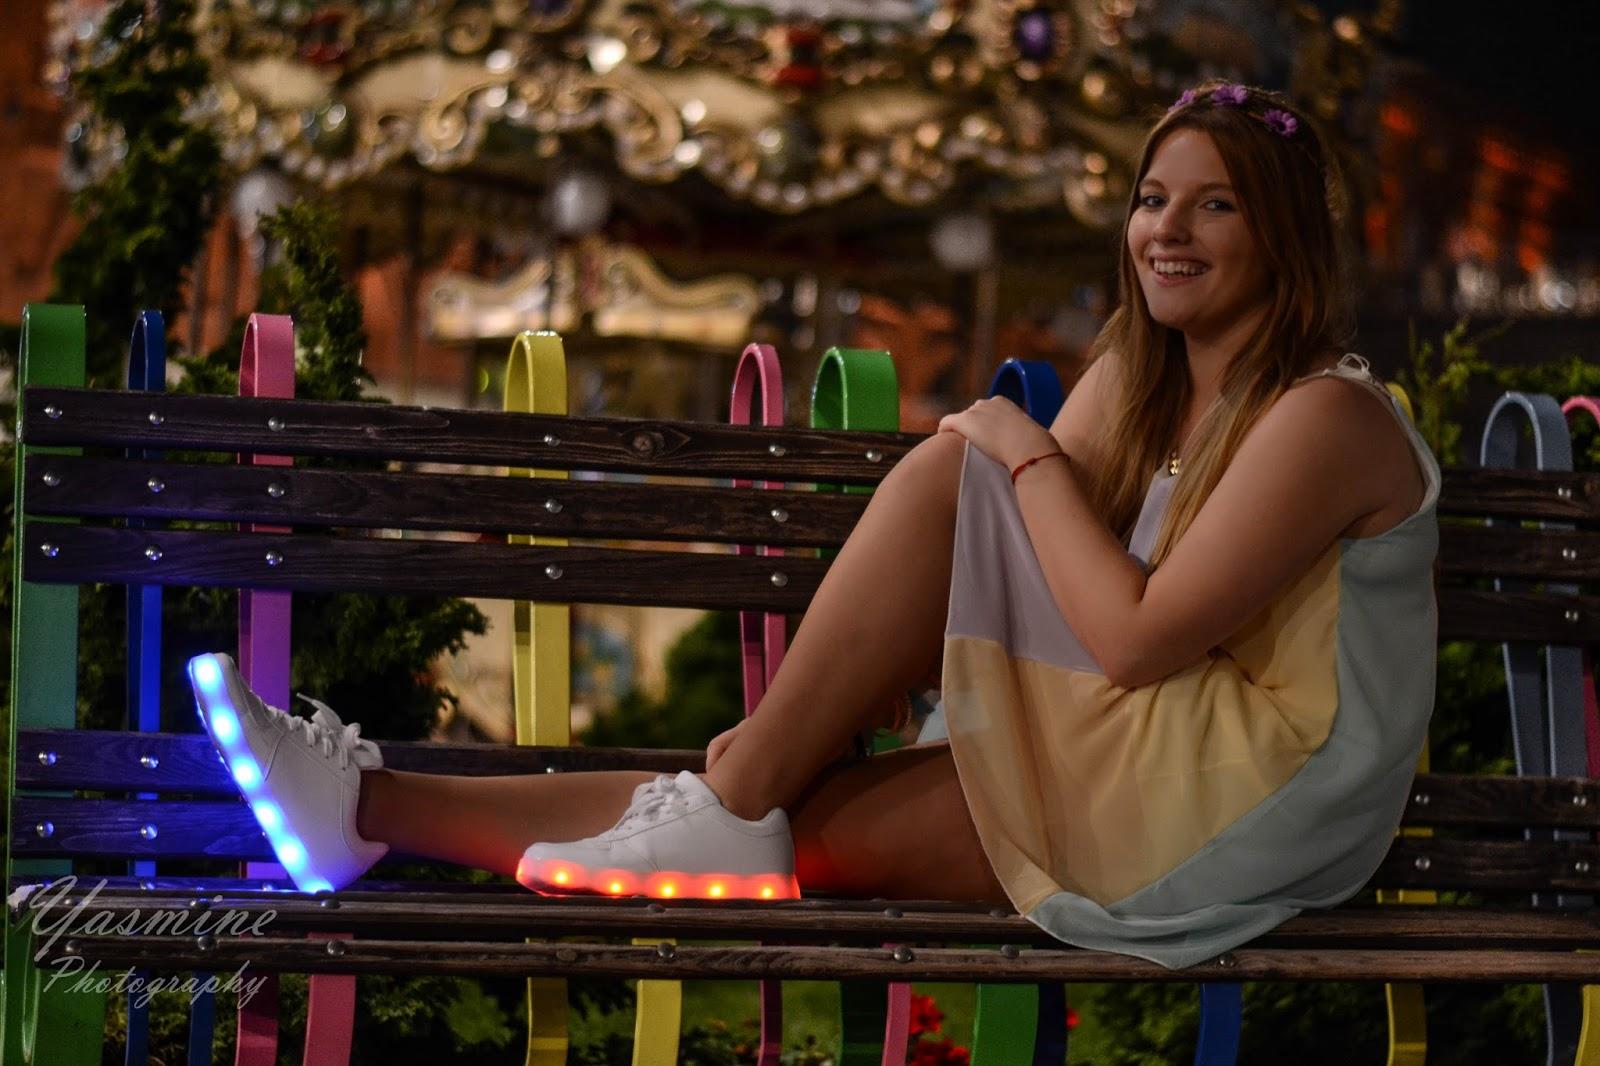 stylizacje festiwalowe ze smeakersami sneakersy disco light renee recenzja melodylaniella lookbook fashion girl